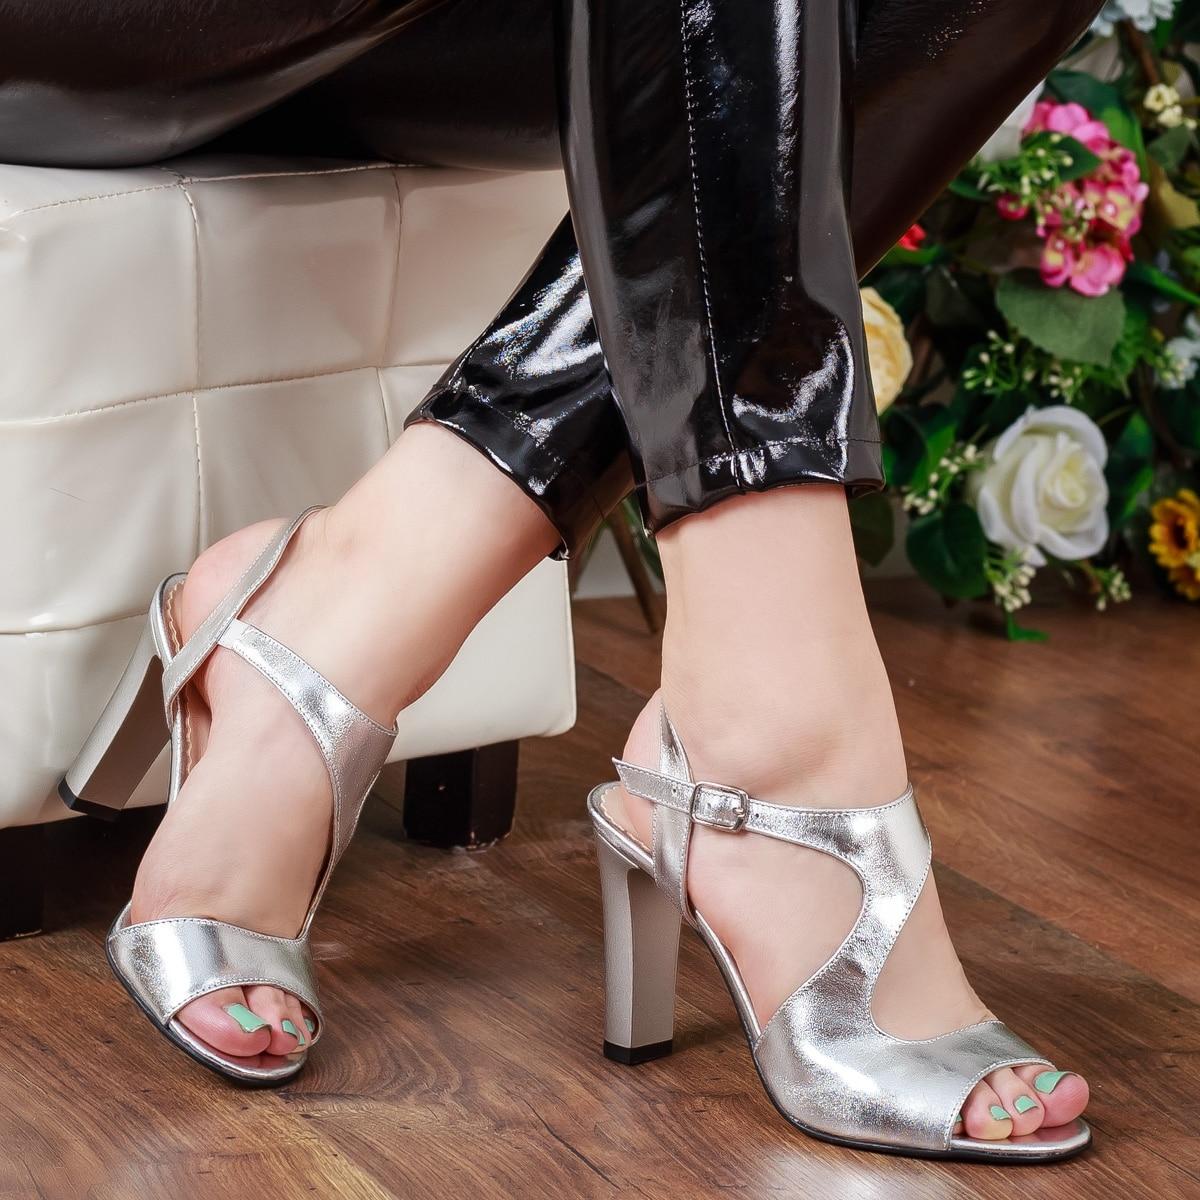 cumpara online cumpara cel mai bine oficial Sandale Piele Rachana argintii cu toc, 37, Argintiu, Piele naturala -  eMAG.ro